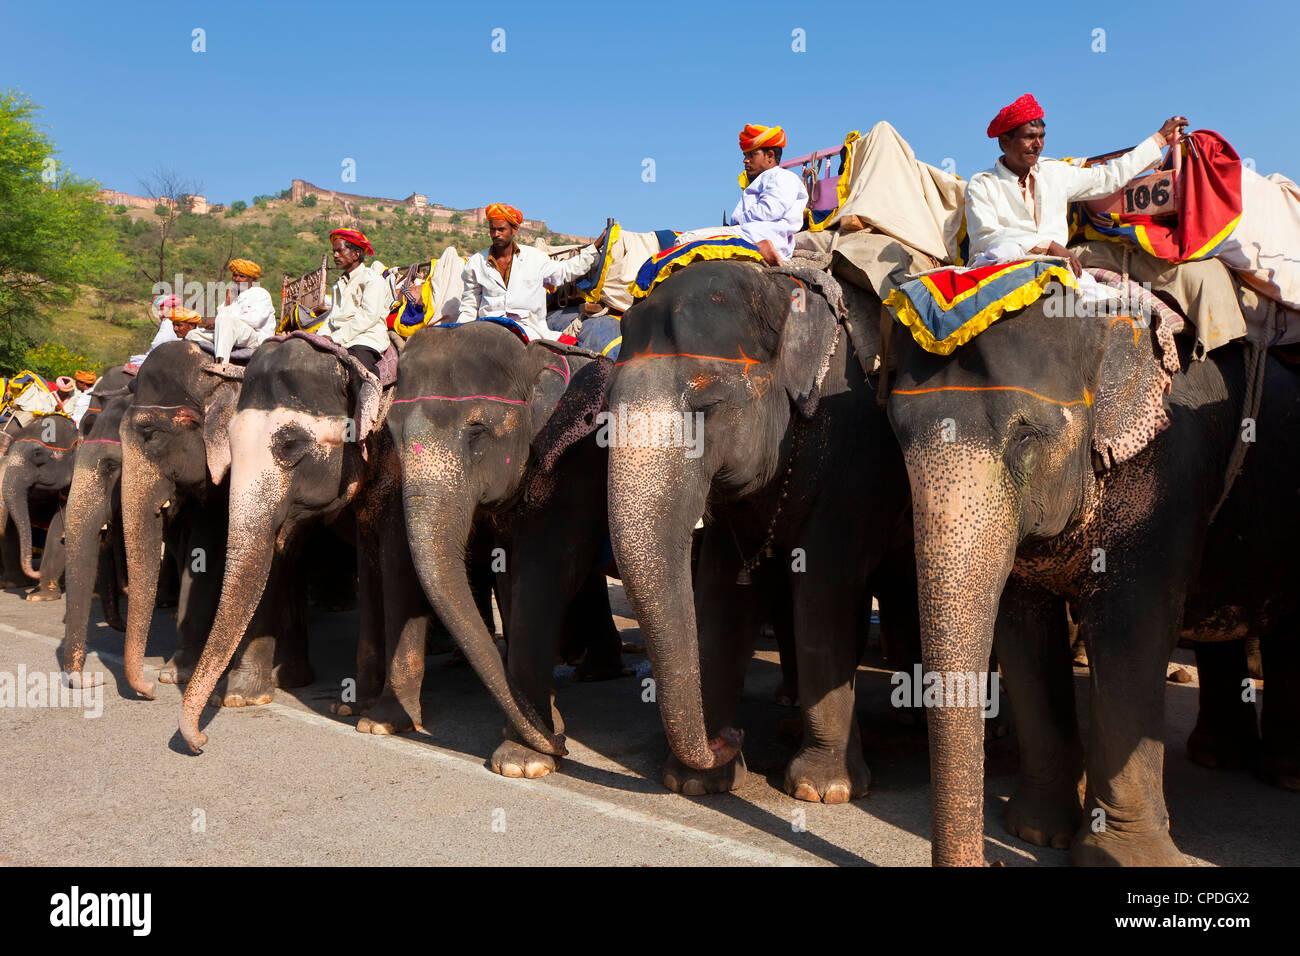 Gli elefanti in attesa di portare i turisti a Forte Amber vicino a Jaipur, Rajasthan, India, Asia Immagini Stock